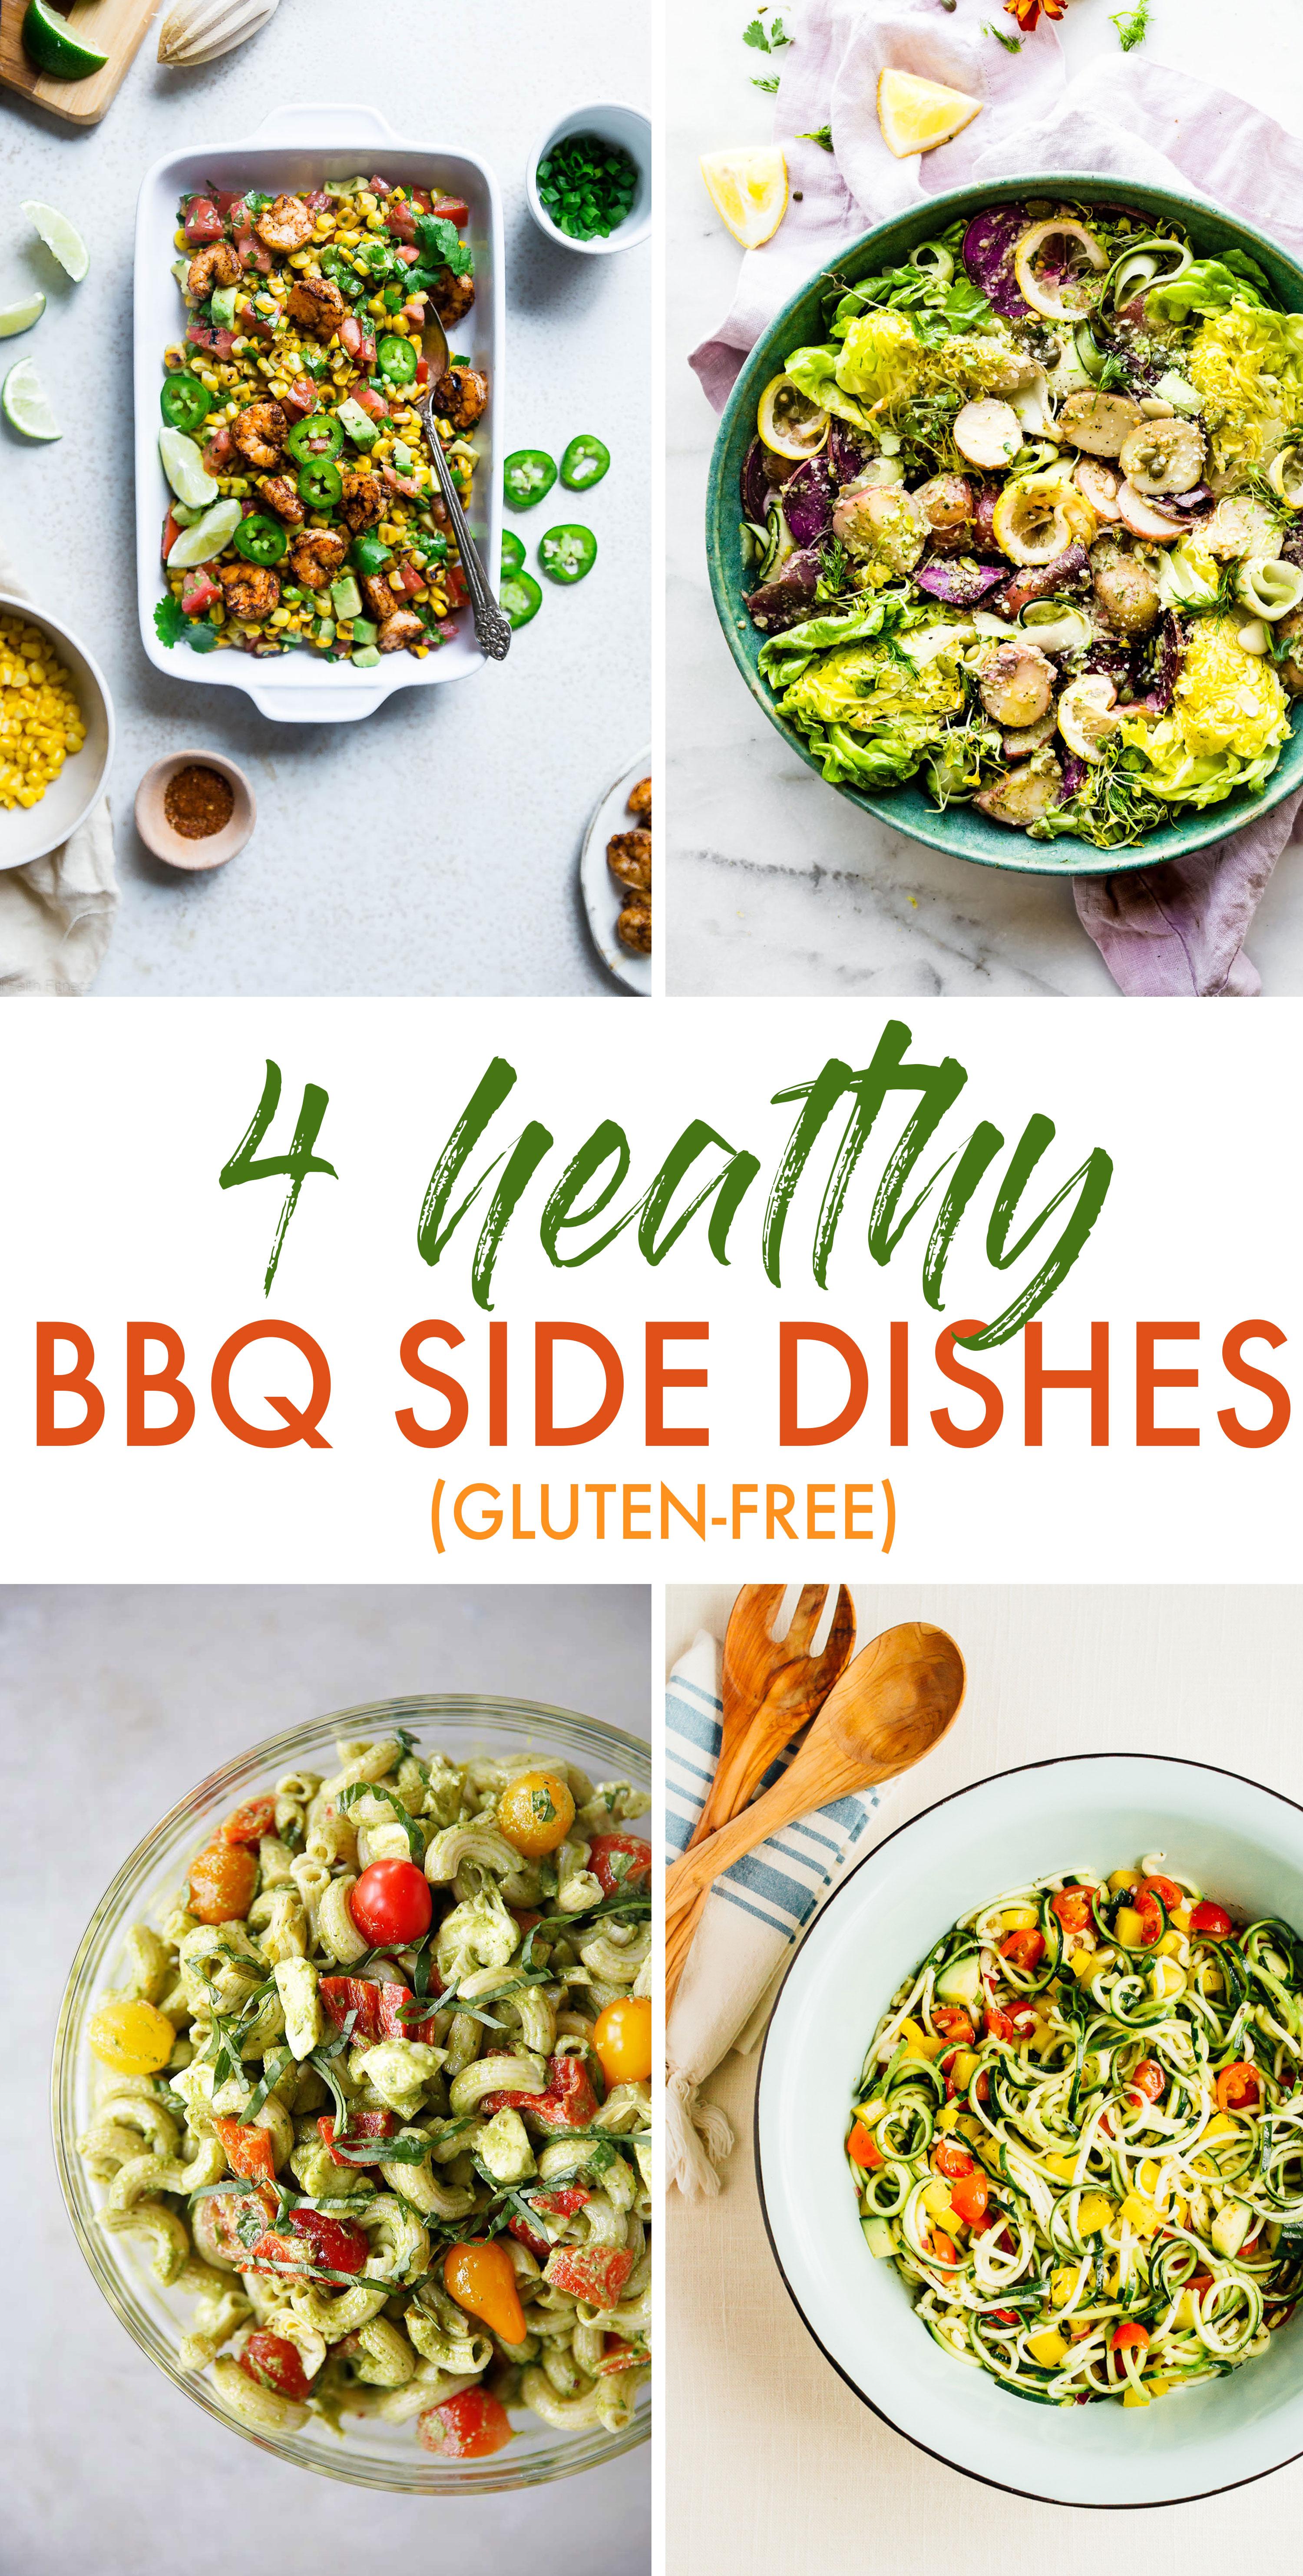 4 Healthy BBQ Side Dishes (Gluten-Free) - Lexi's Clean Kitchen